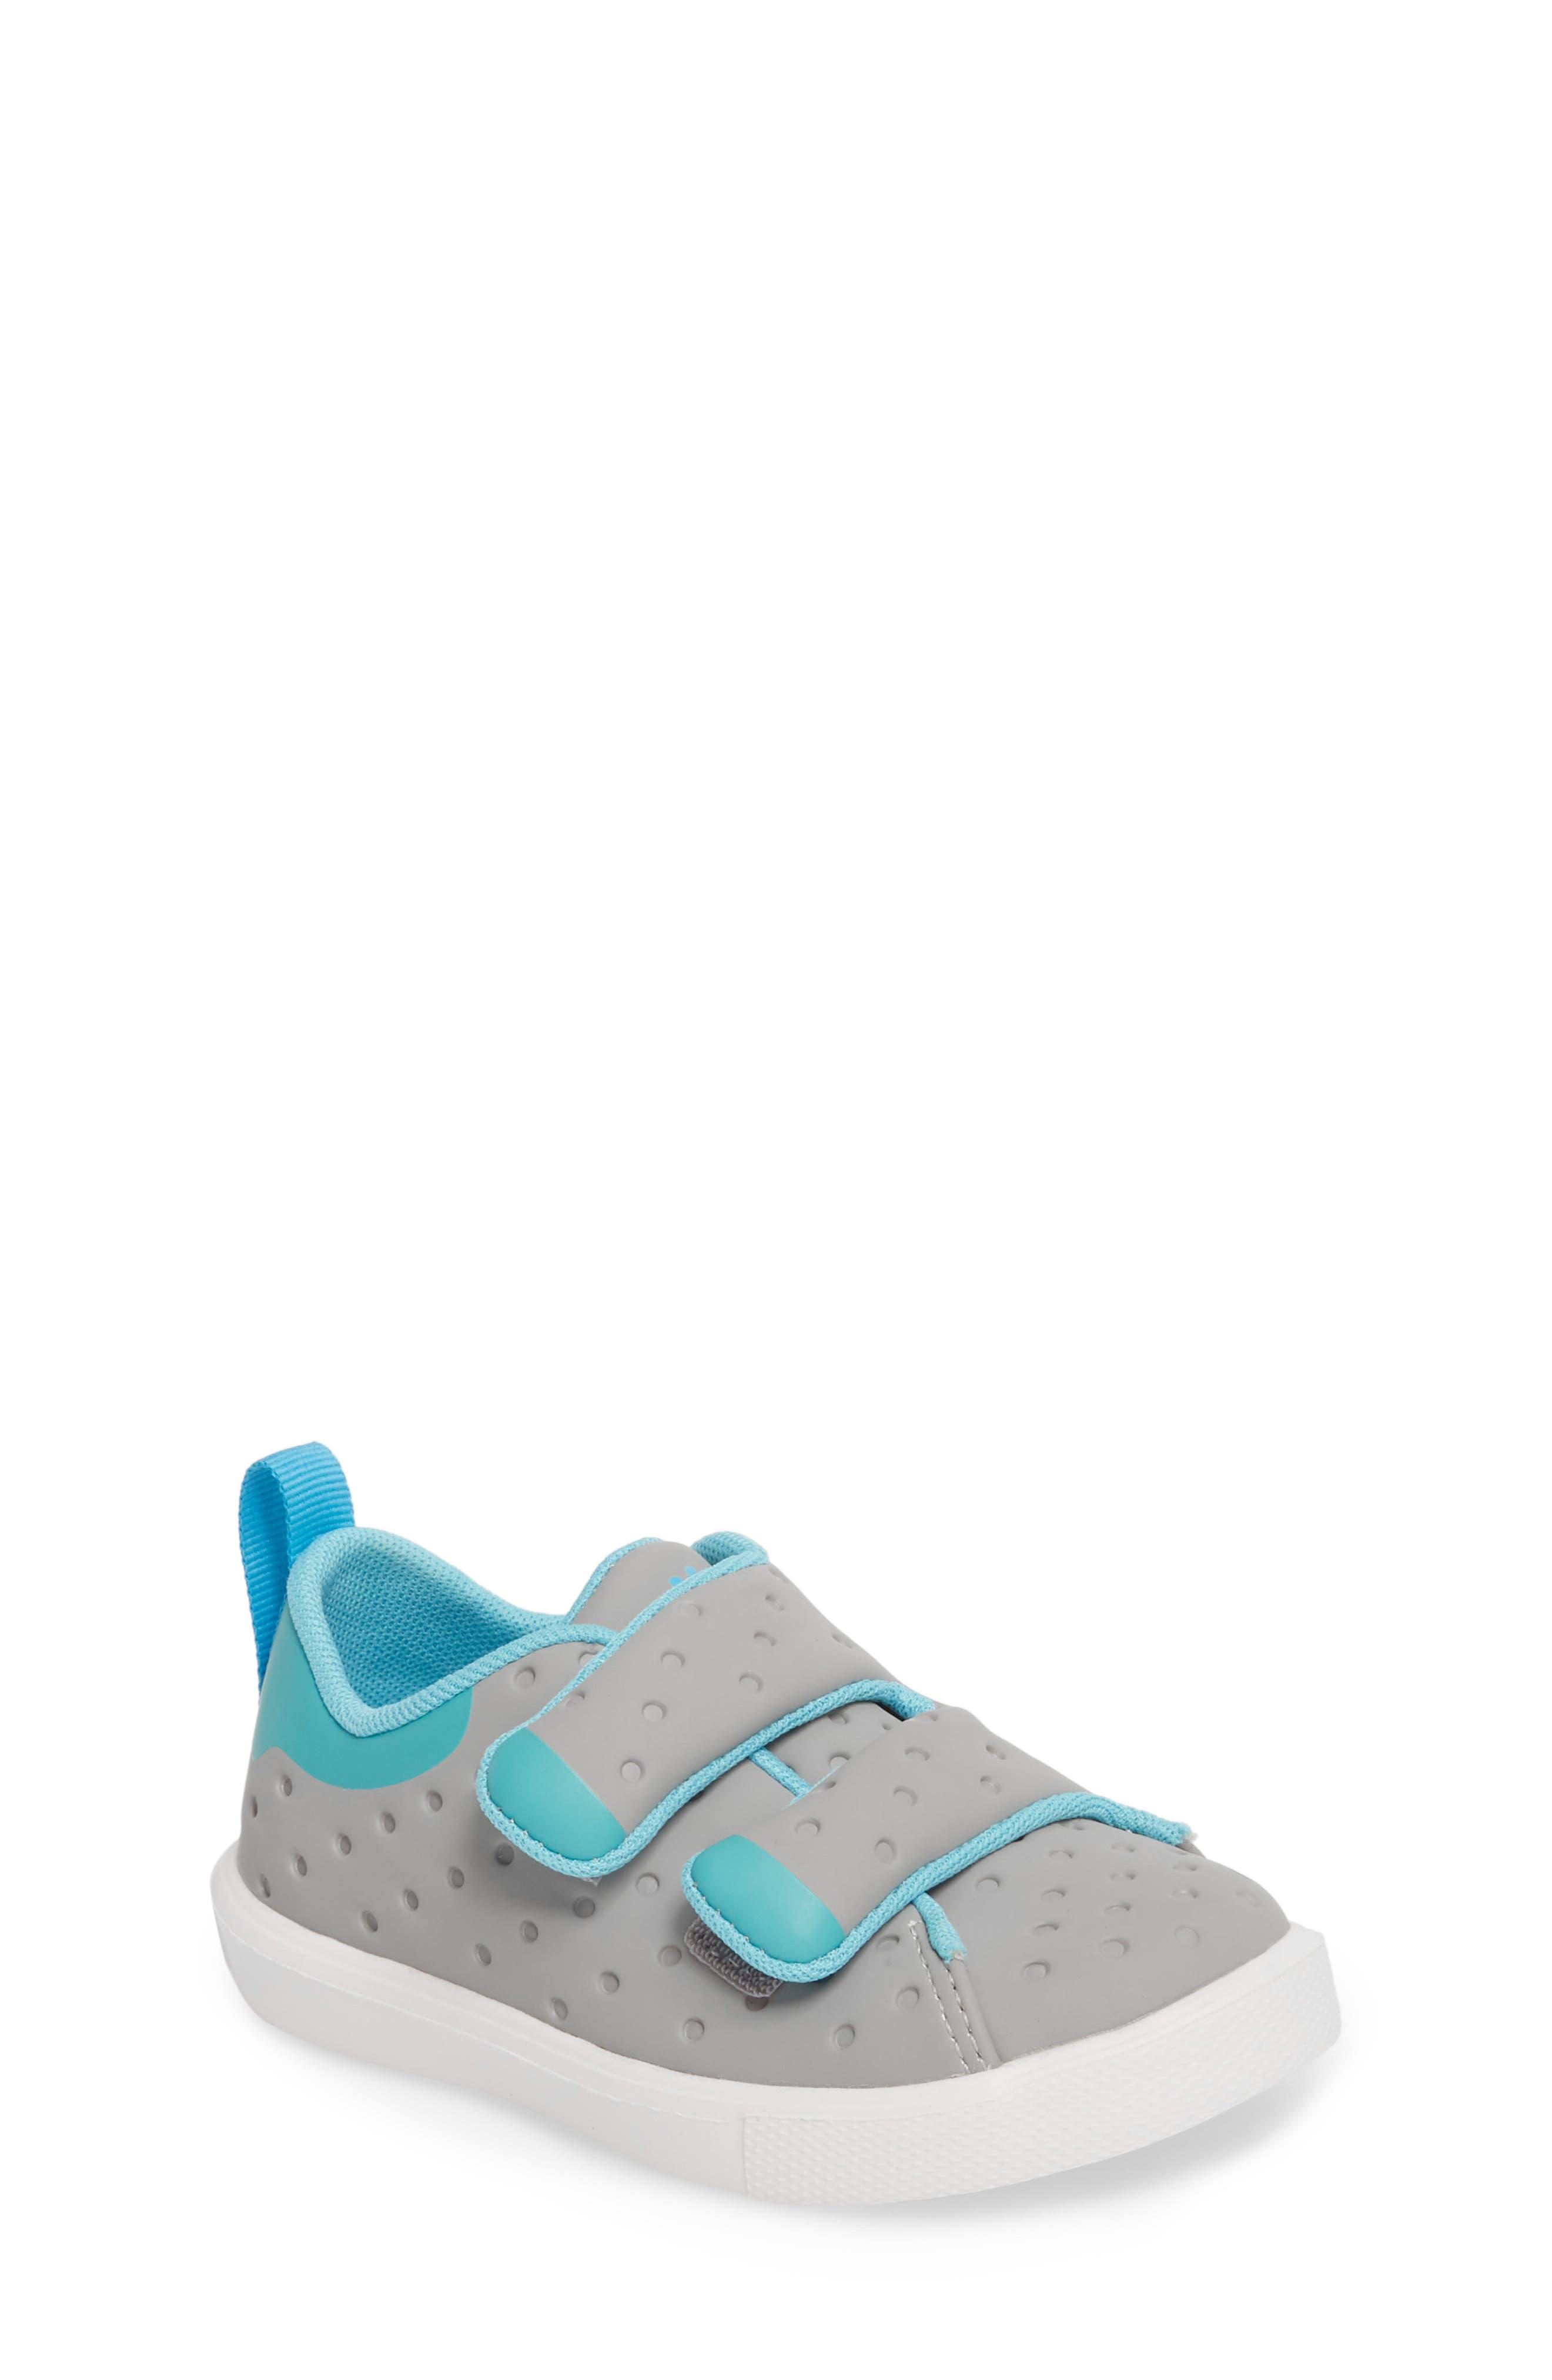 Monaco Sneaker,                             Main thumbnail 1, color,                             PIGEON GREY/ POOL BOOL/ WHITE